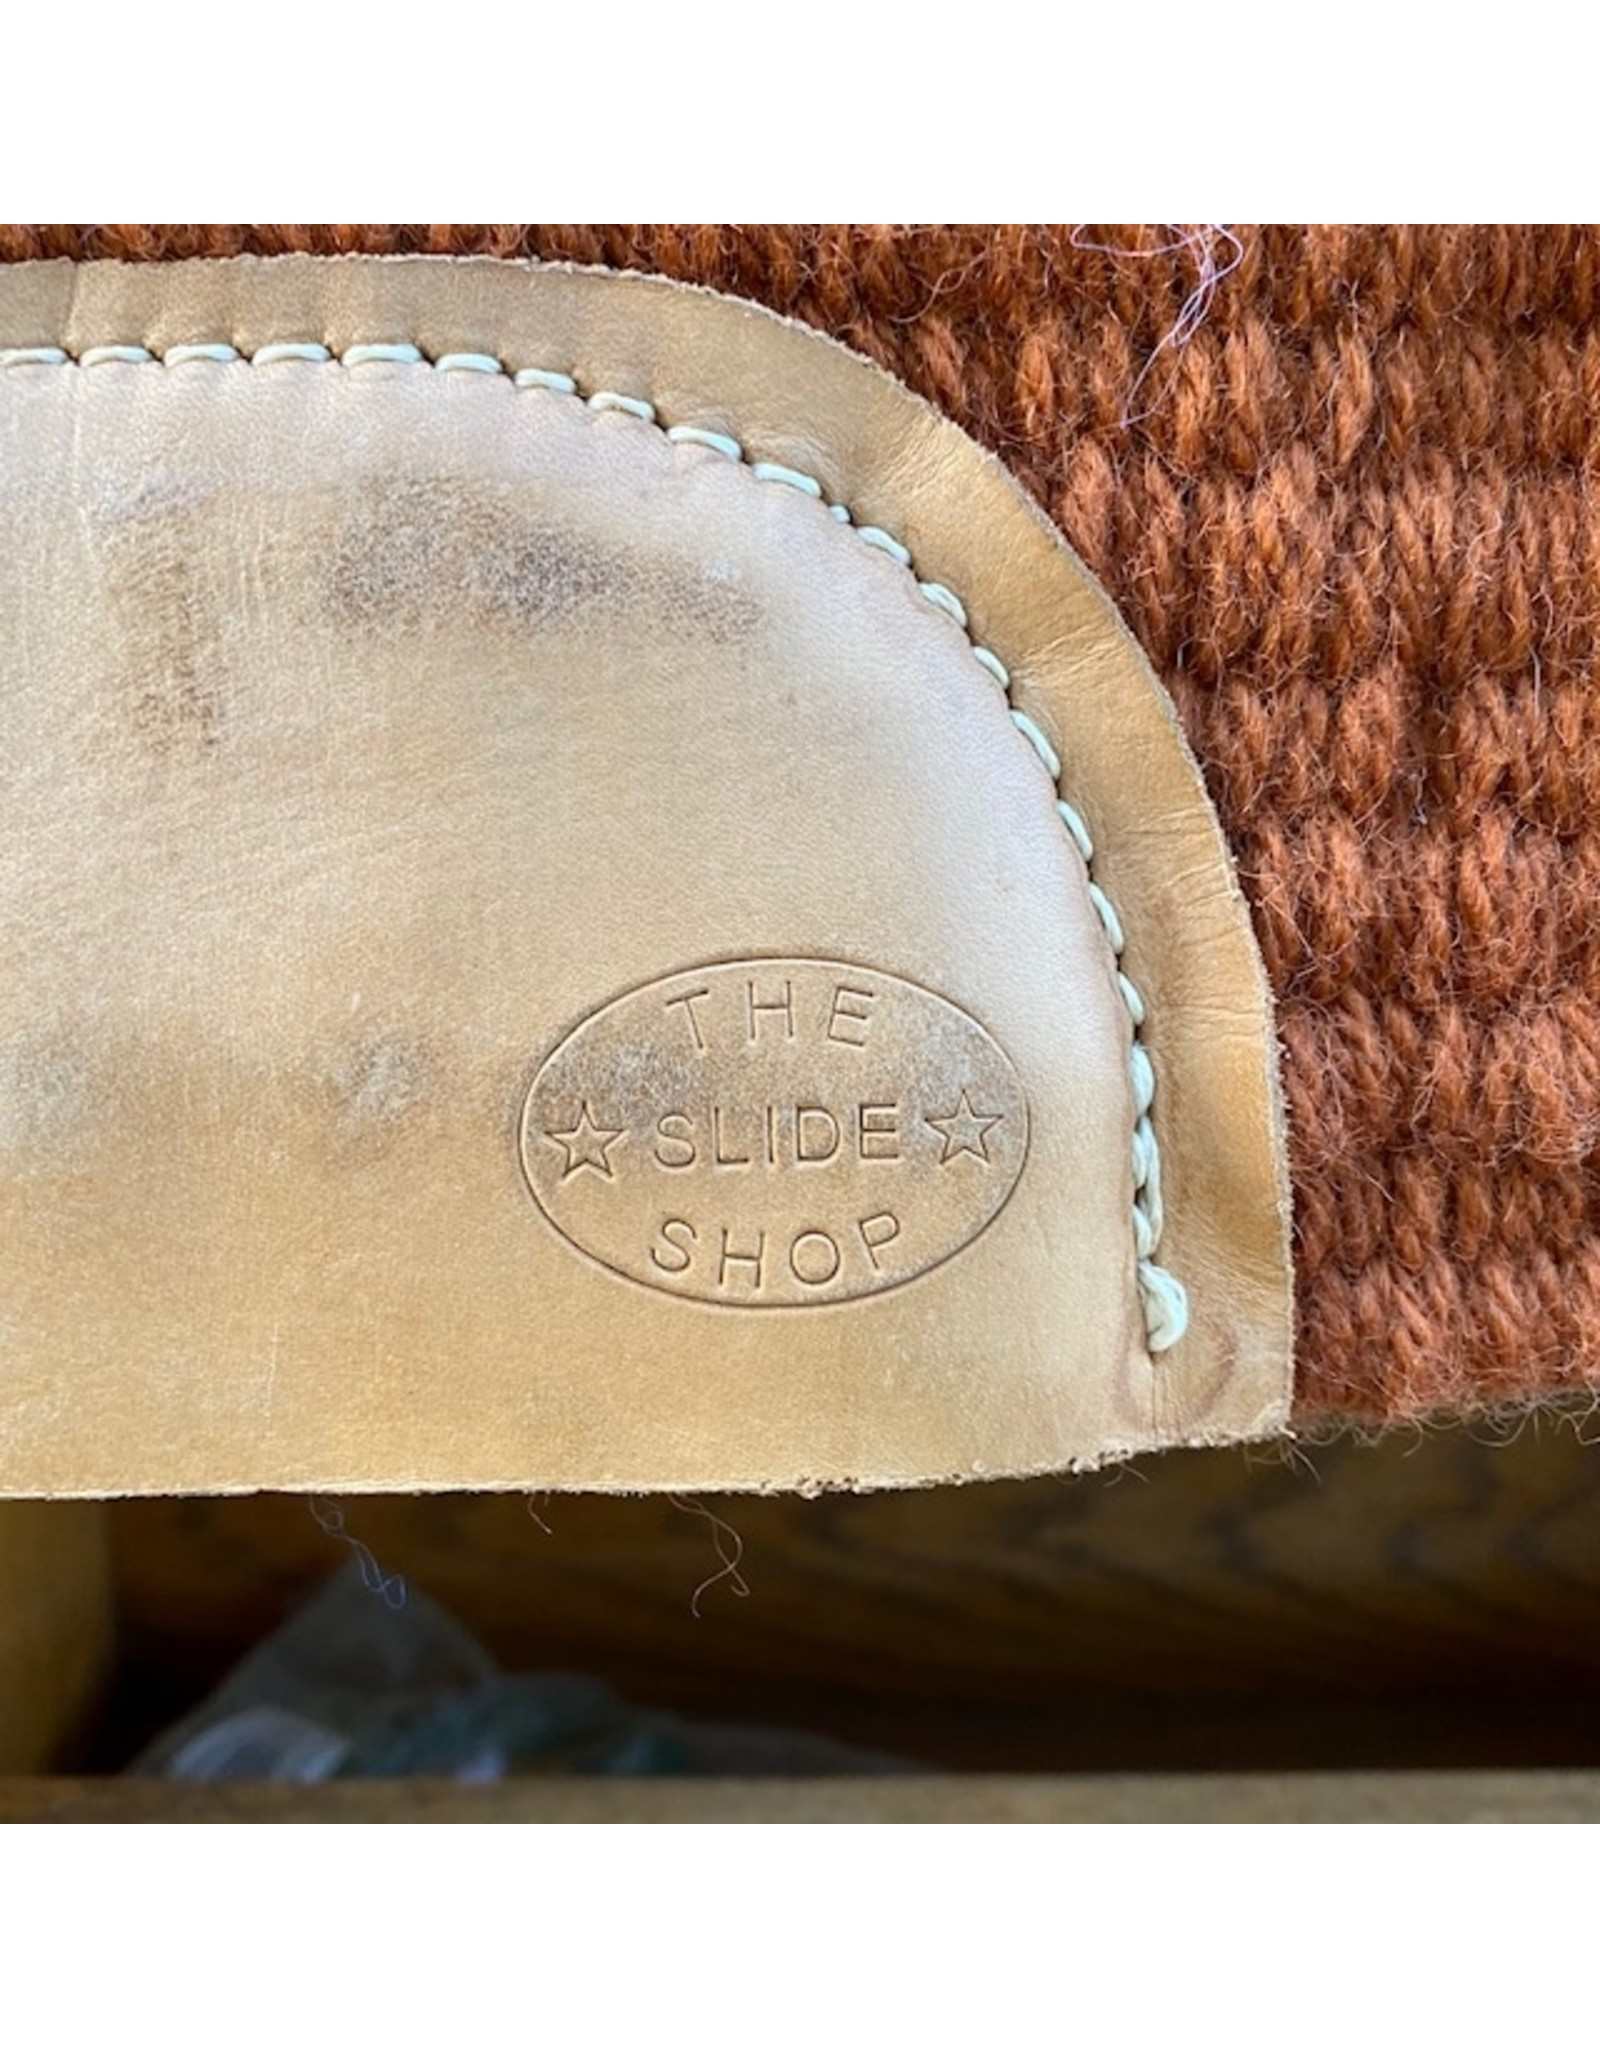 Slide Shop Custom Show/Reining Pad 32x41 Browns & Yellows